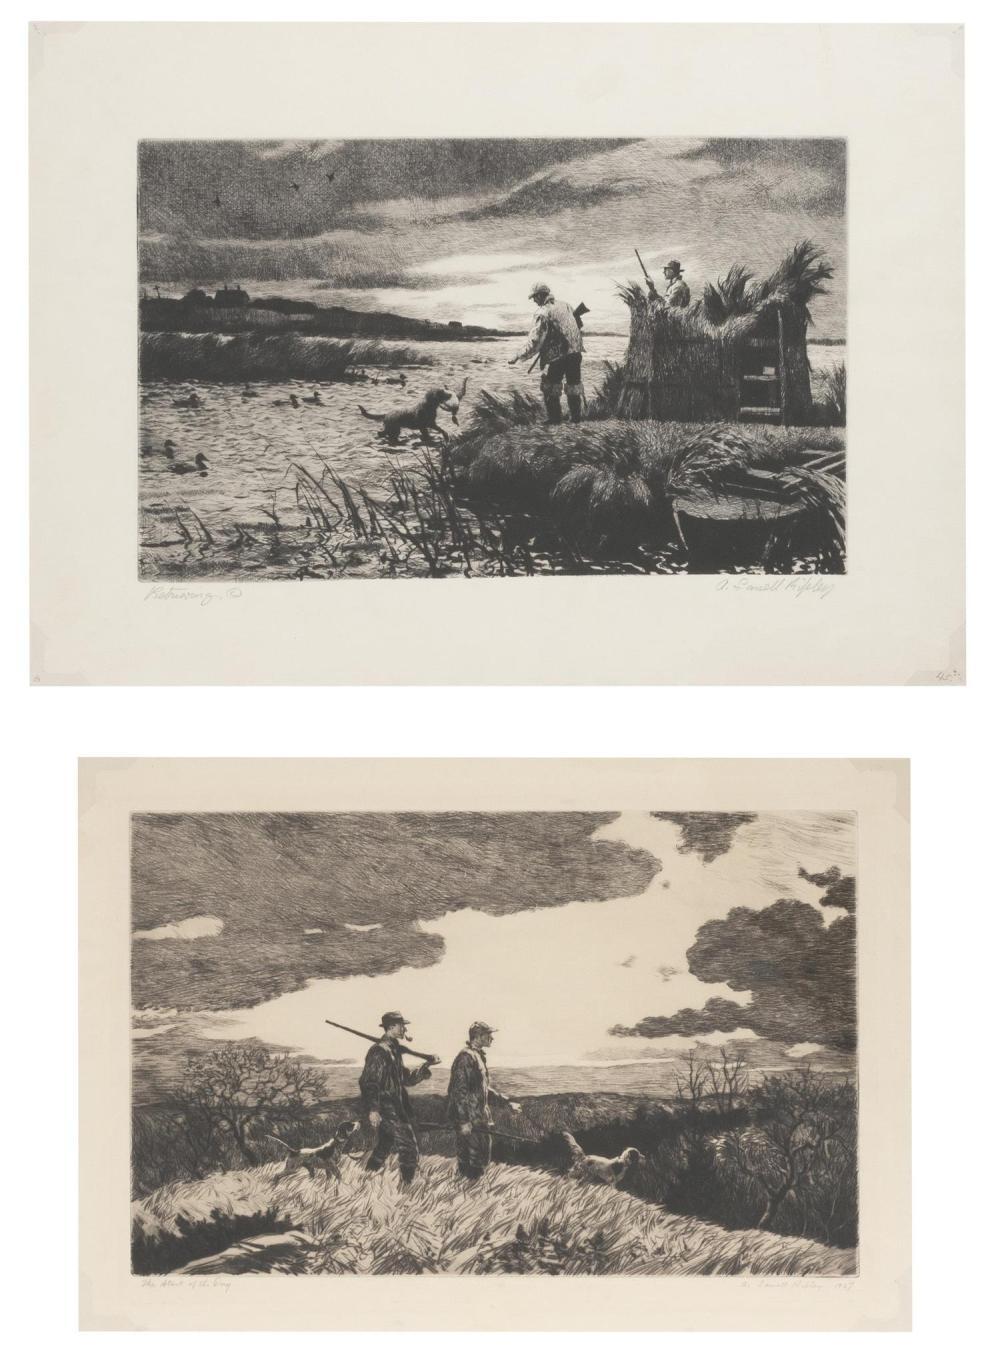 AIDEN LASSELL RIPLEY, Massachusetts/New York, 1896-1969, Two works: